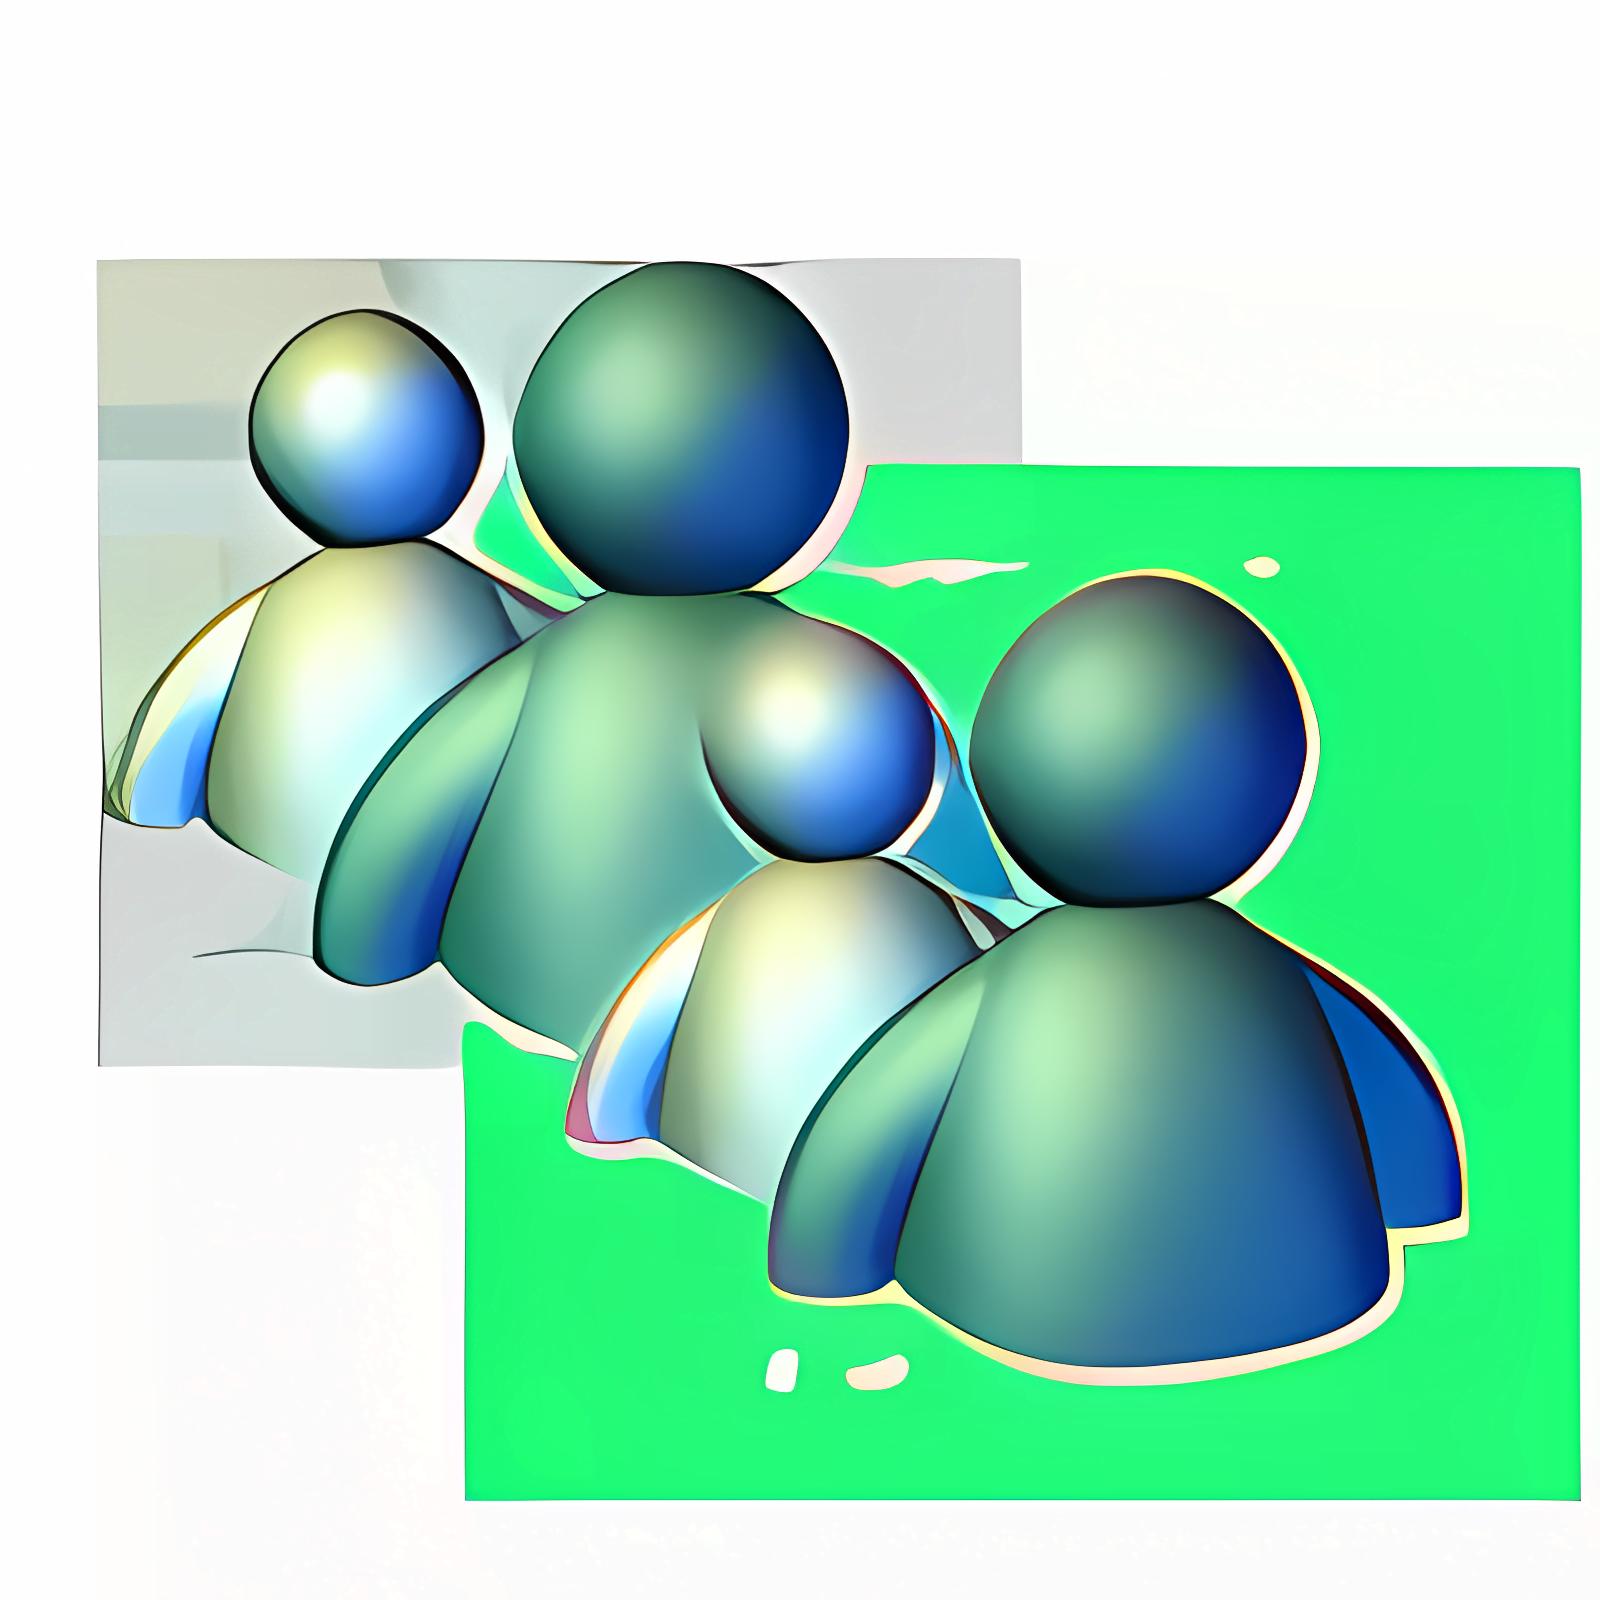 MSN Messenger Polygamy 15.0